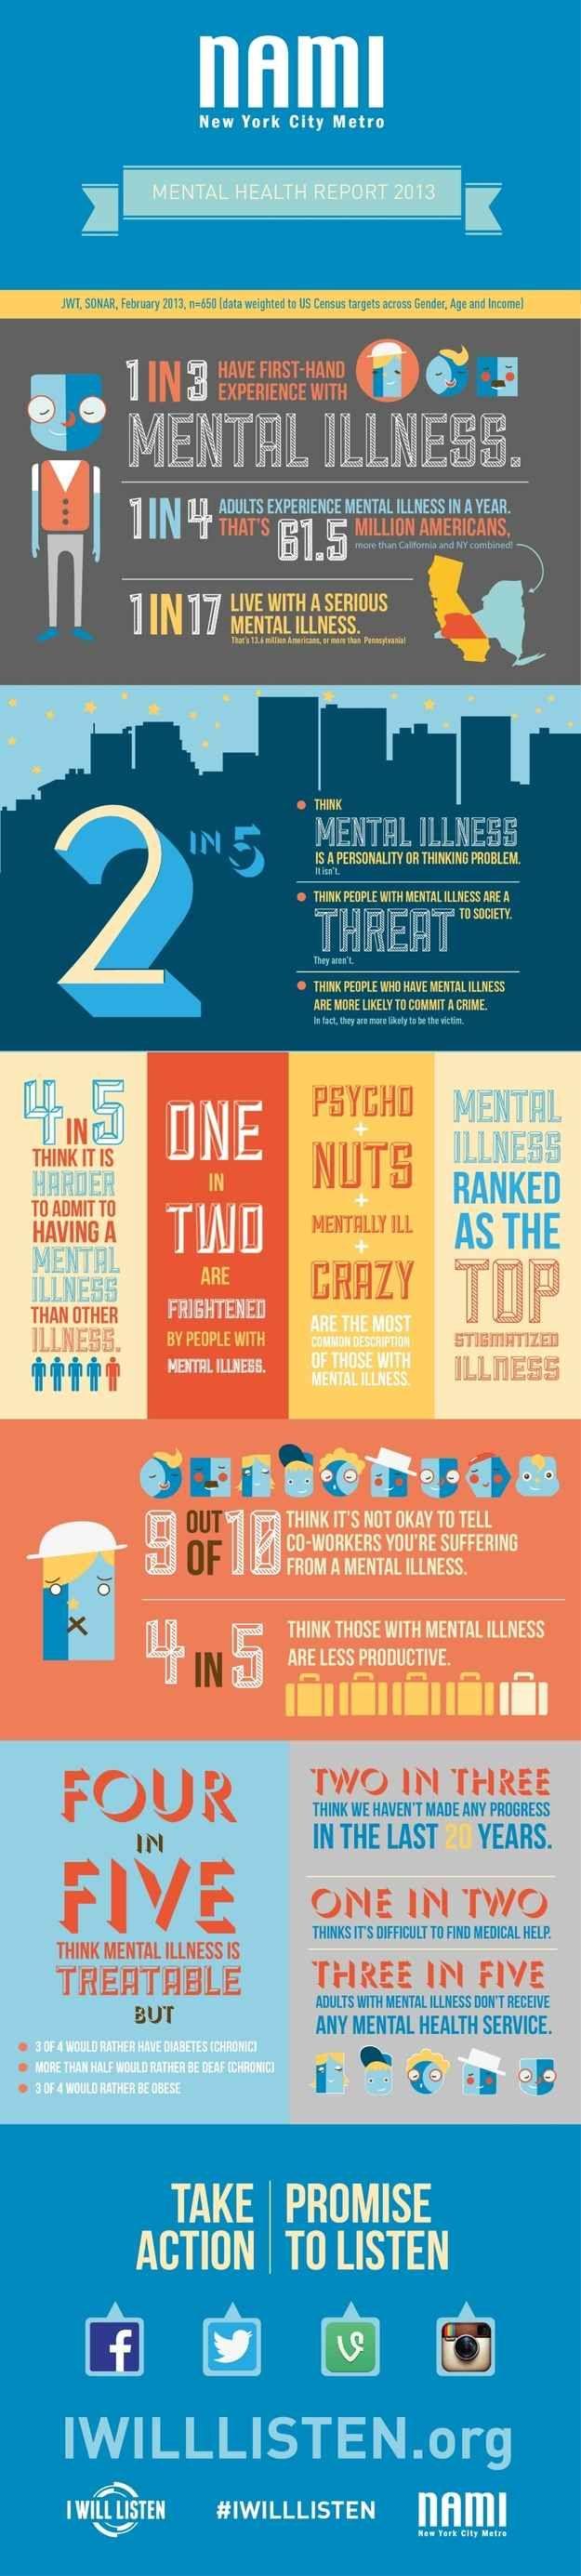 World Mental Health Day- Oct. 10th